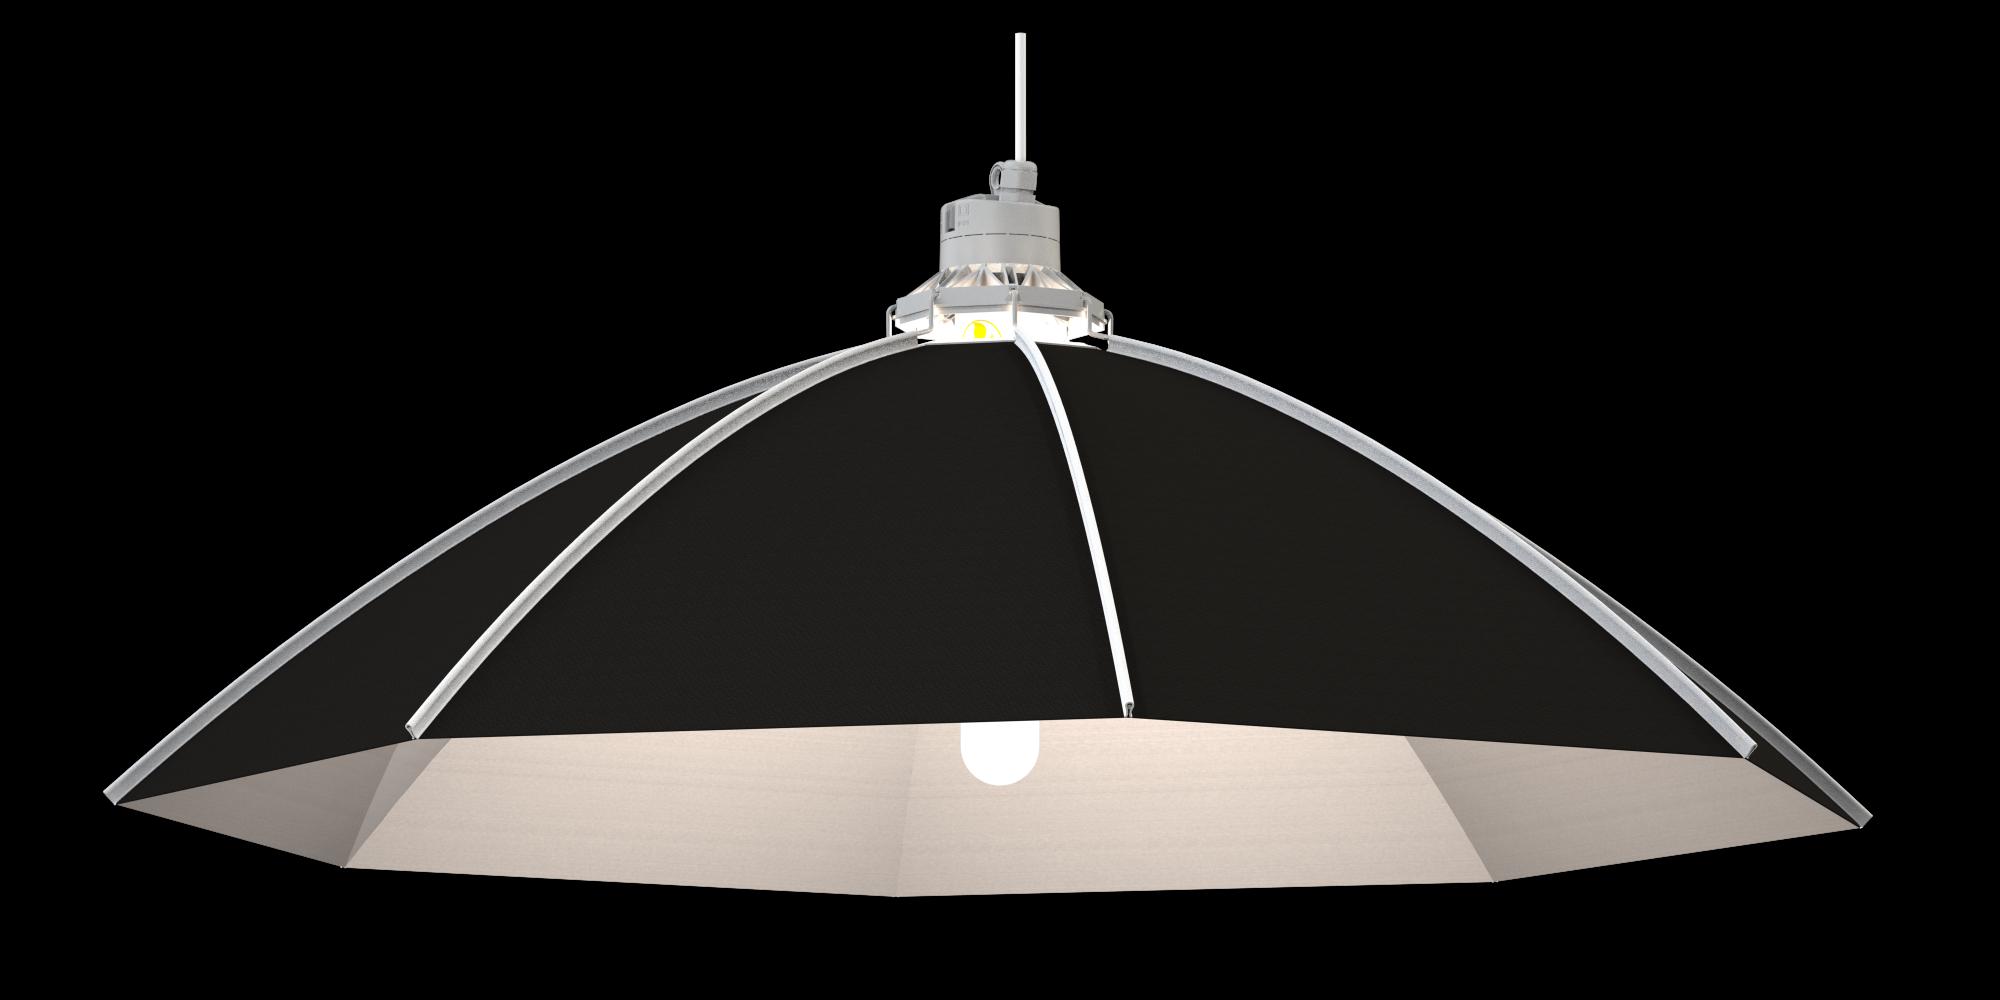 Daisy  reflectorφ100cm(デイジーリフレクターφ100cm)